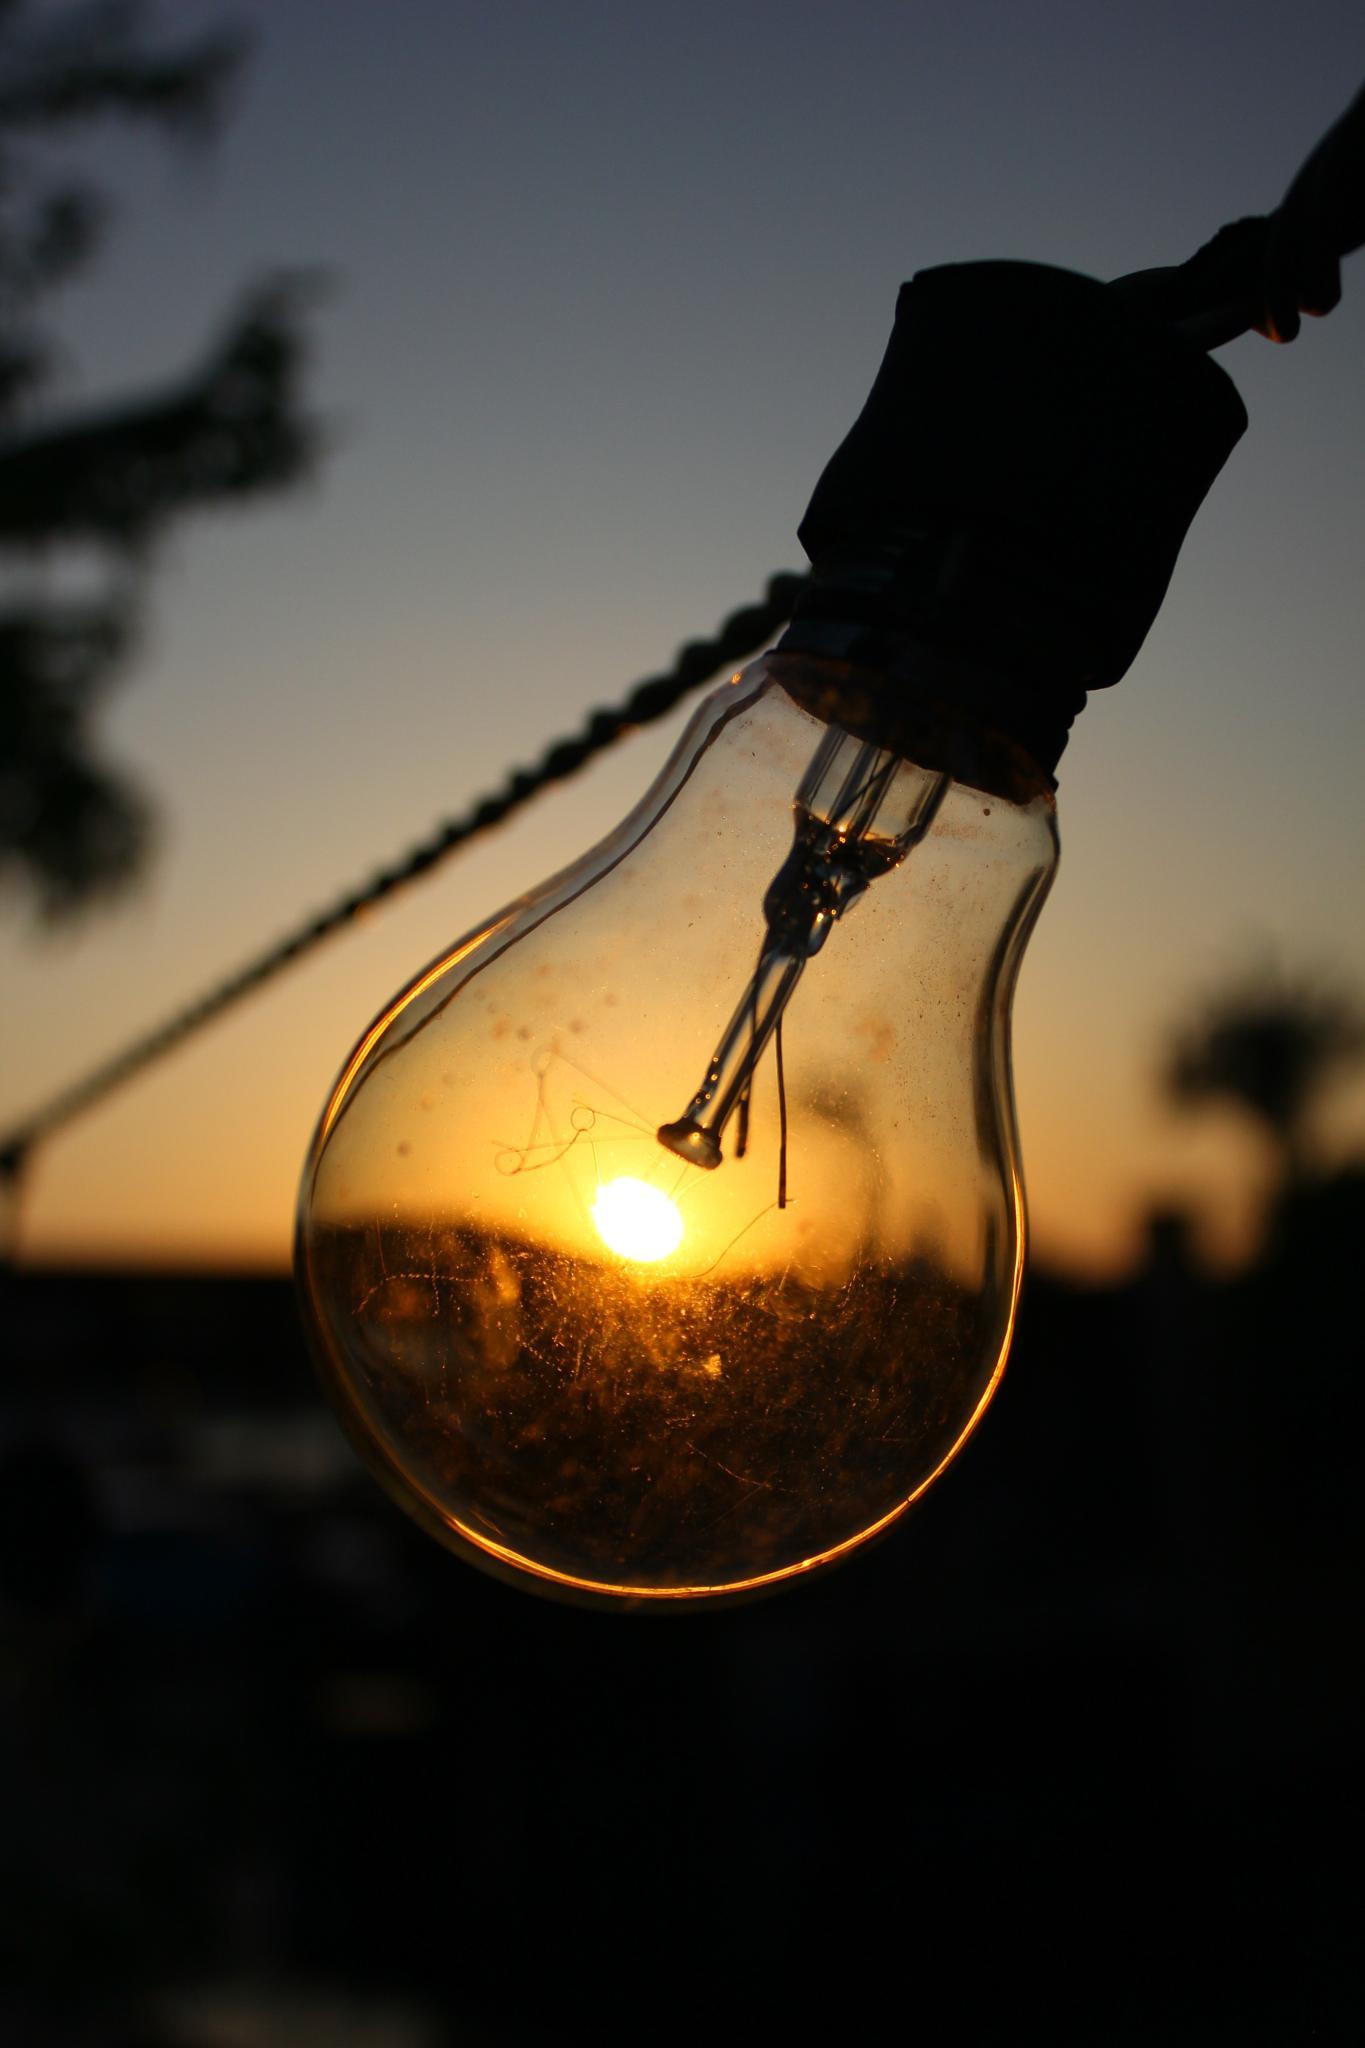 sun lamp by ahmed gamal abdalfattah